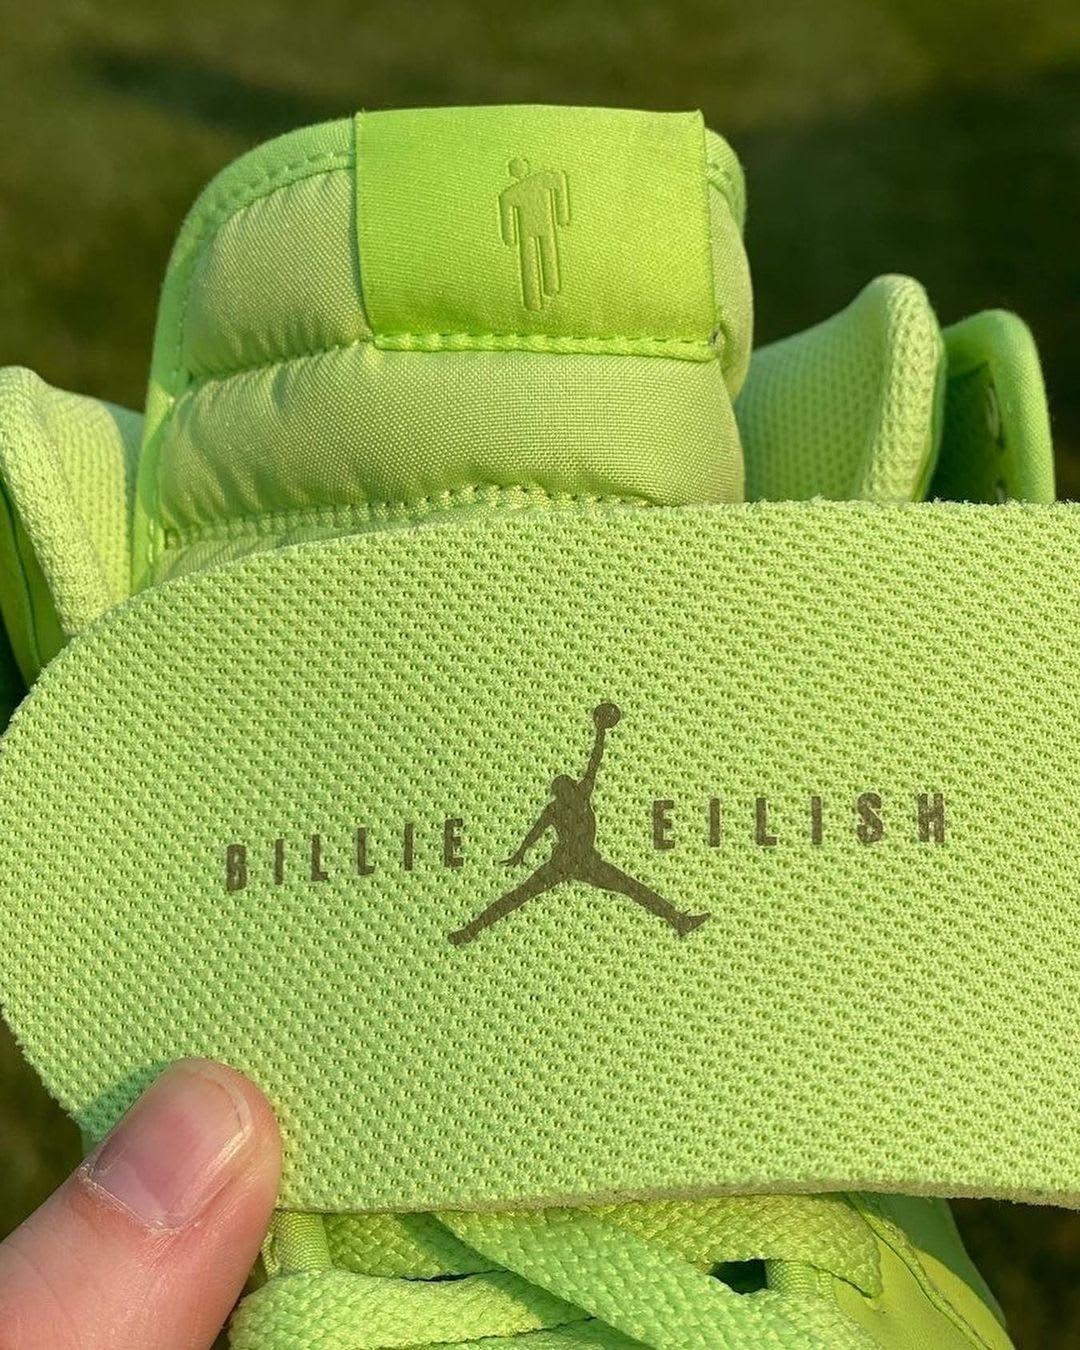 Billie Eilish x Air Jordan 1 KO 'Ghost Green' DN2857-330 (Insole)